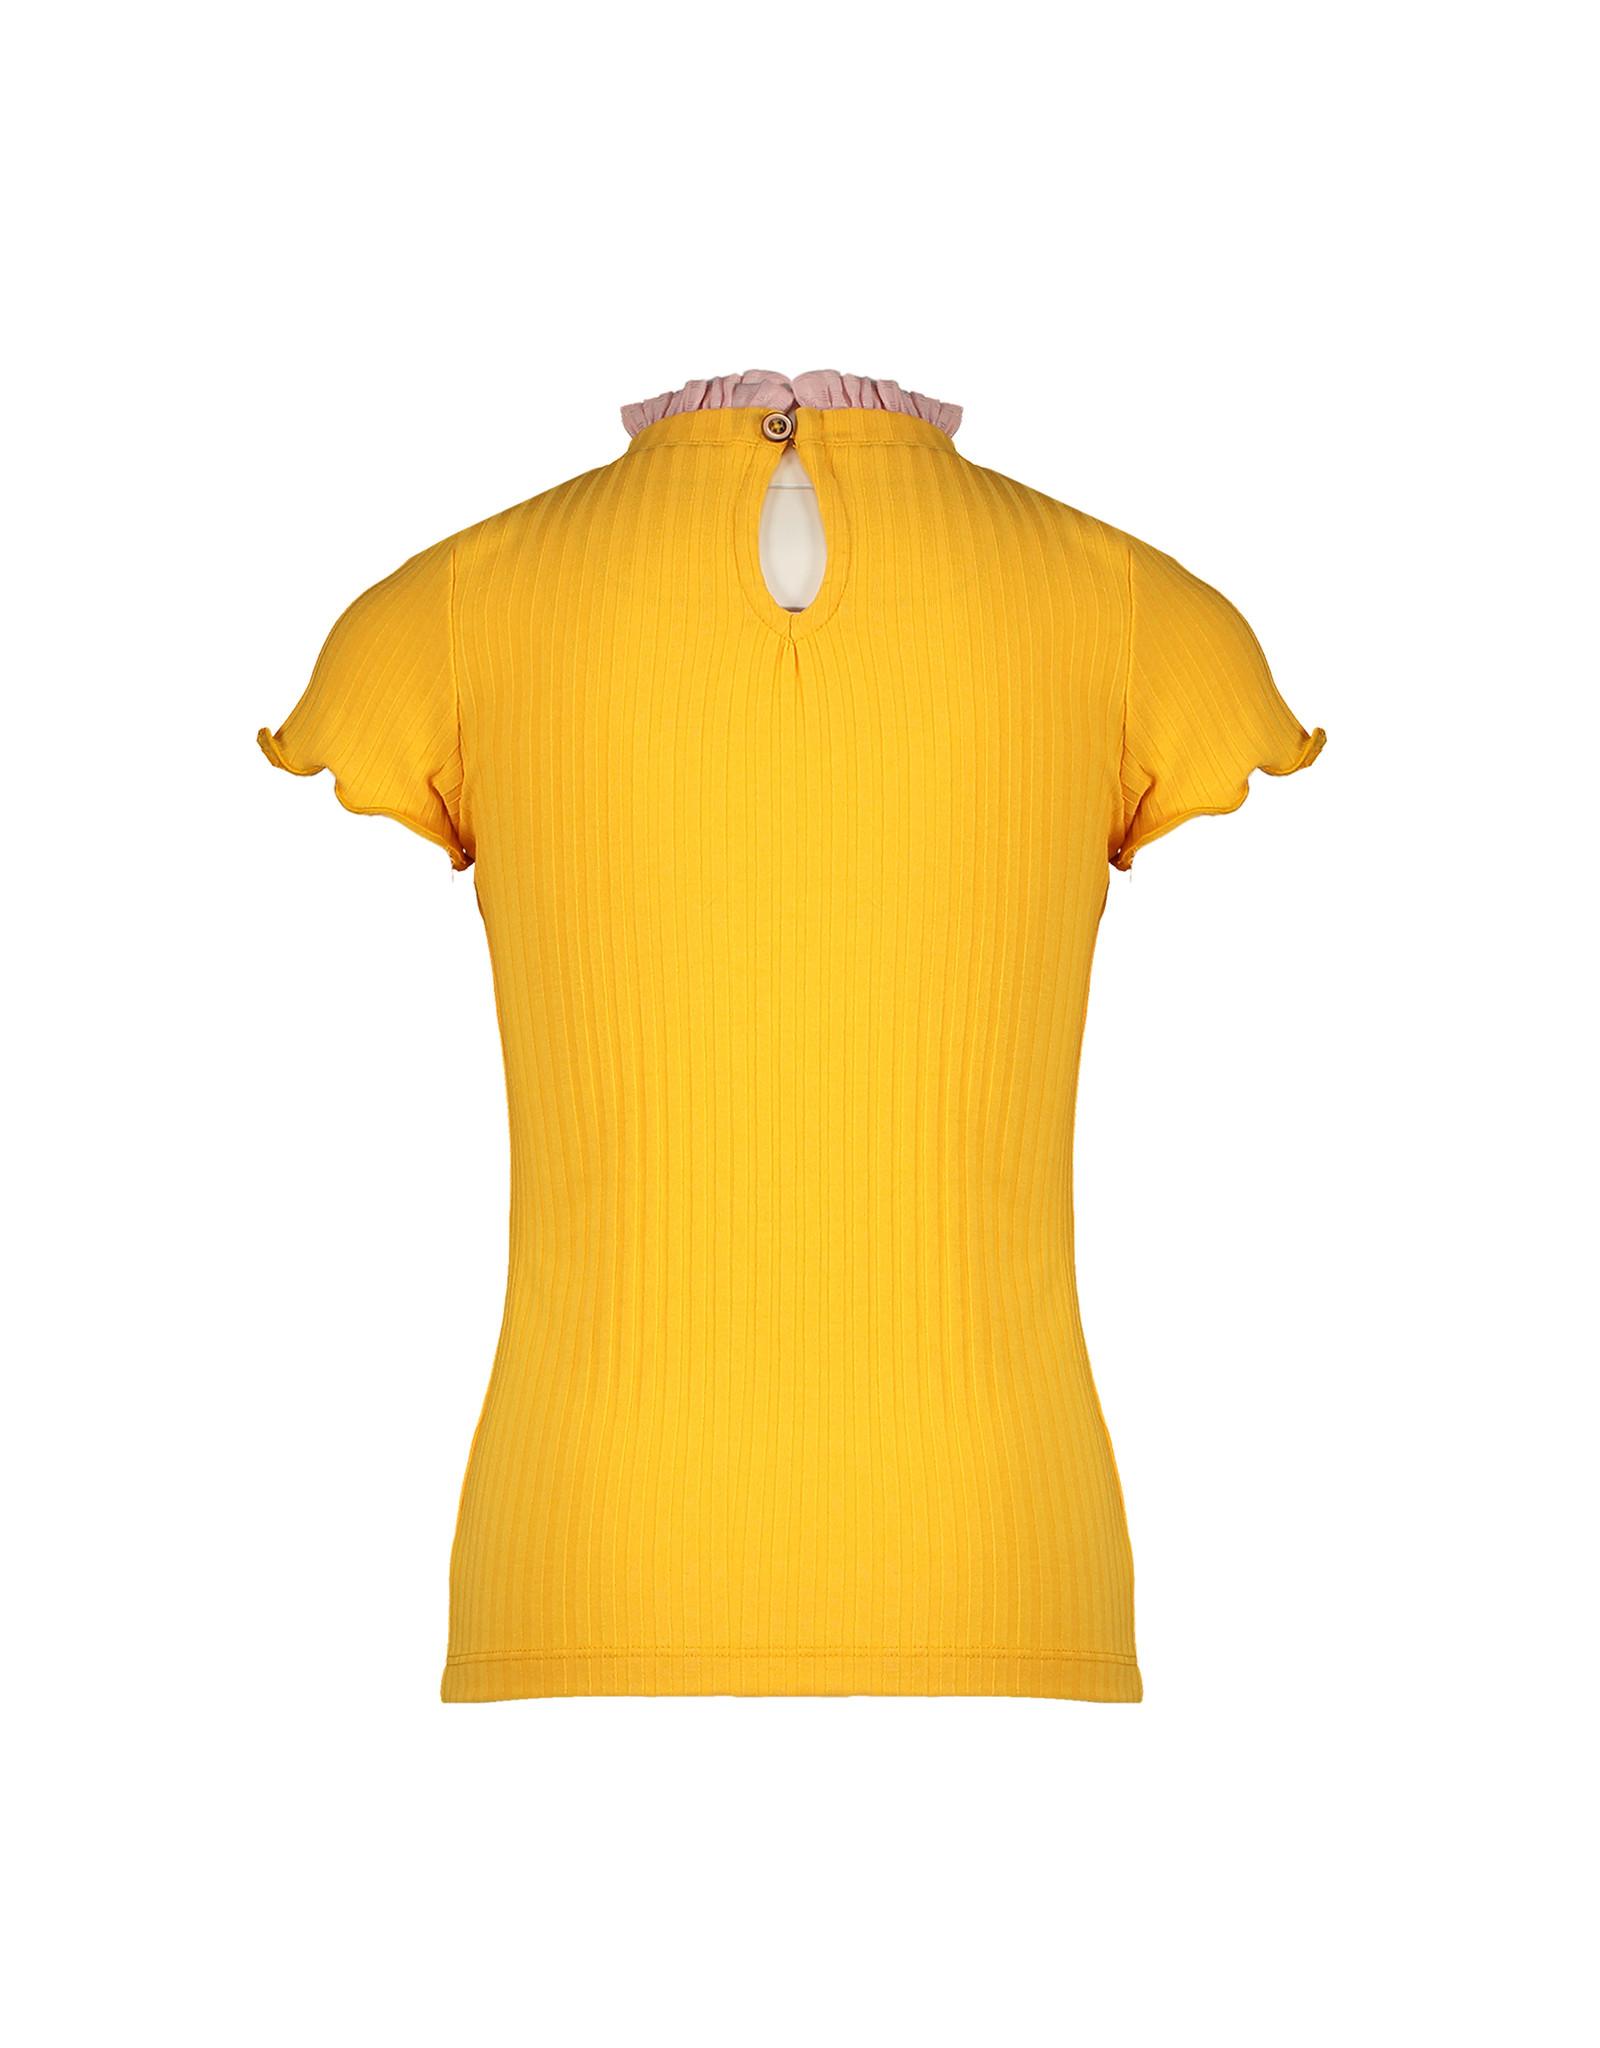 Nono Kim ss rib jersey tshirt with woven ruffled detail at neck